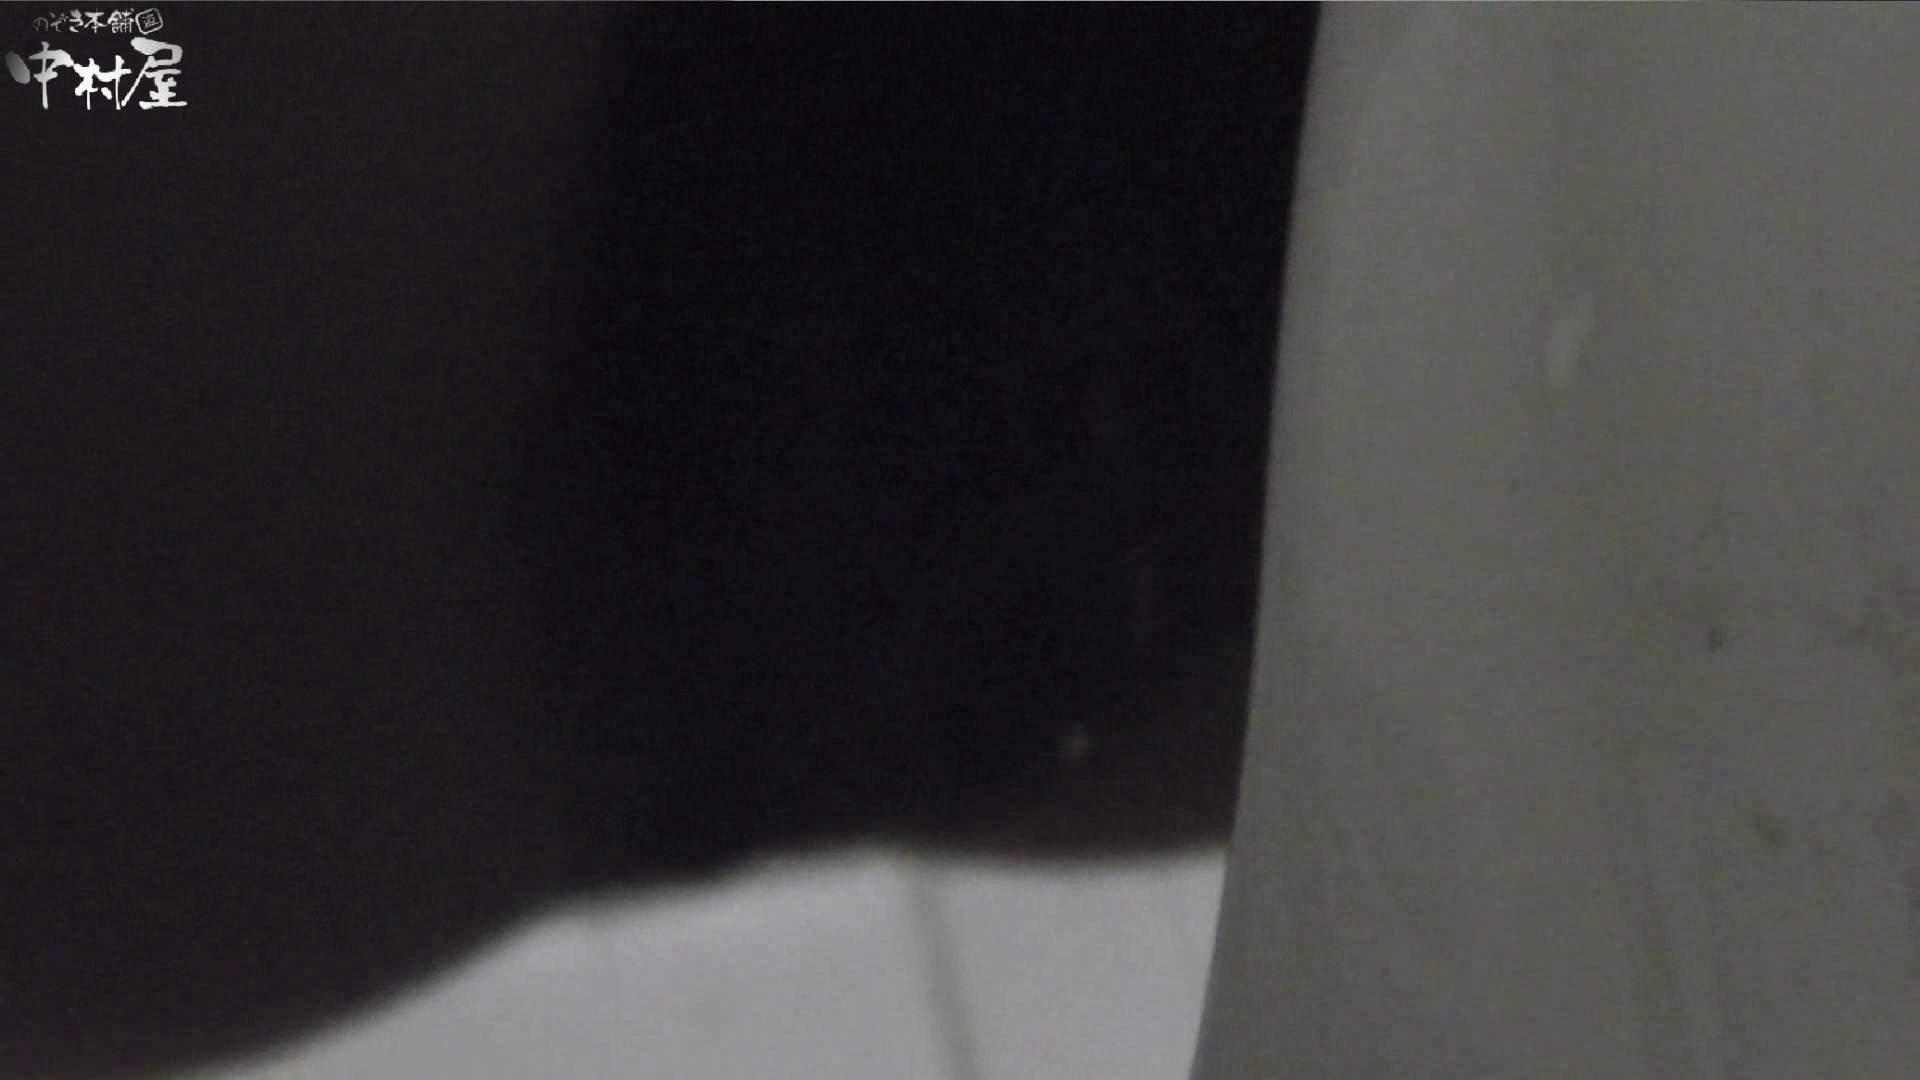 vol.09 命がけ潜伏洗面所! ハミ具さま 潜入 すけべAV動画紹介 96PIX 68